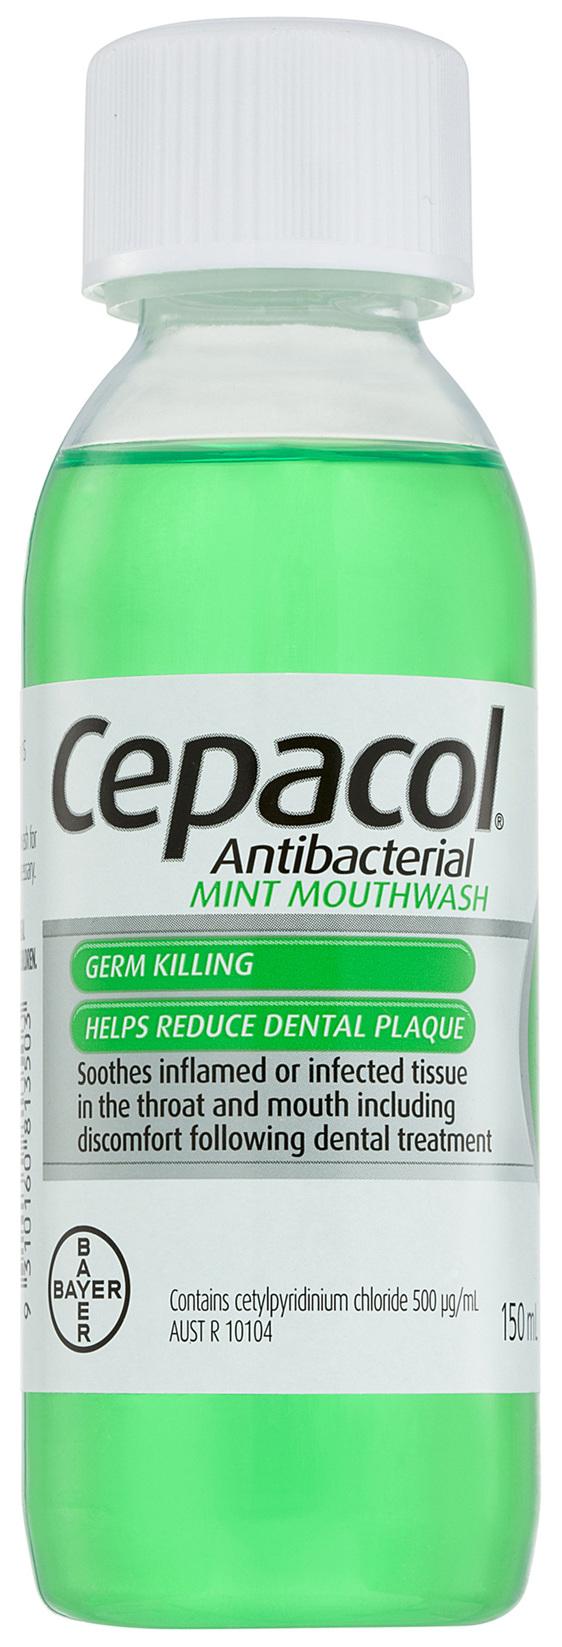 Cepacol Antibacterial Mint Mouthwash150mL